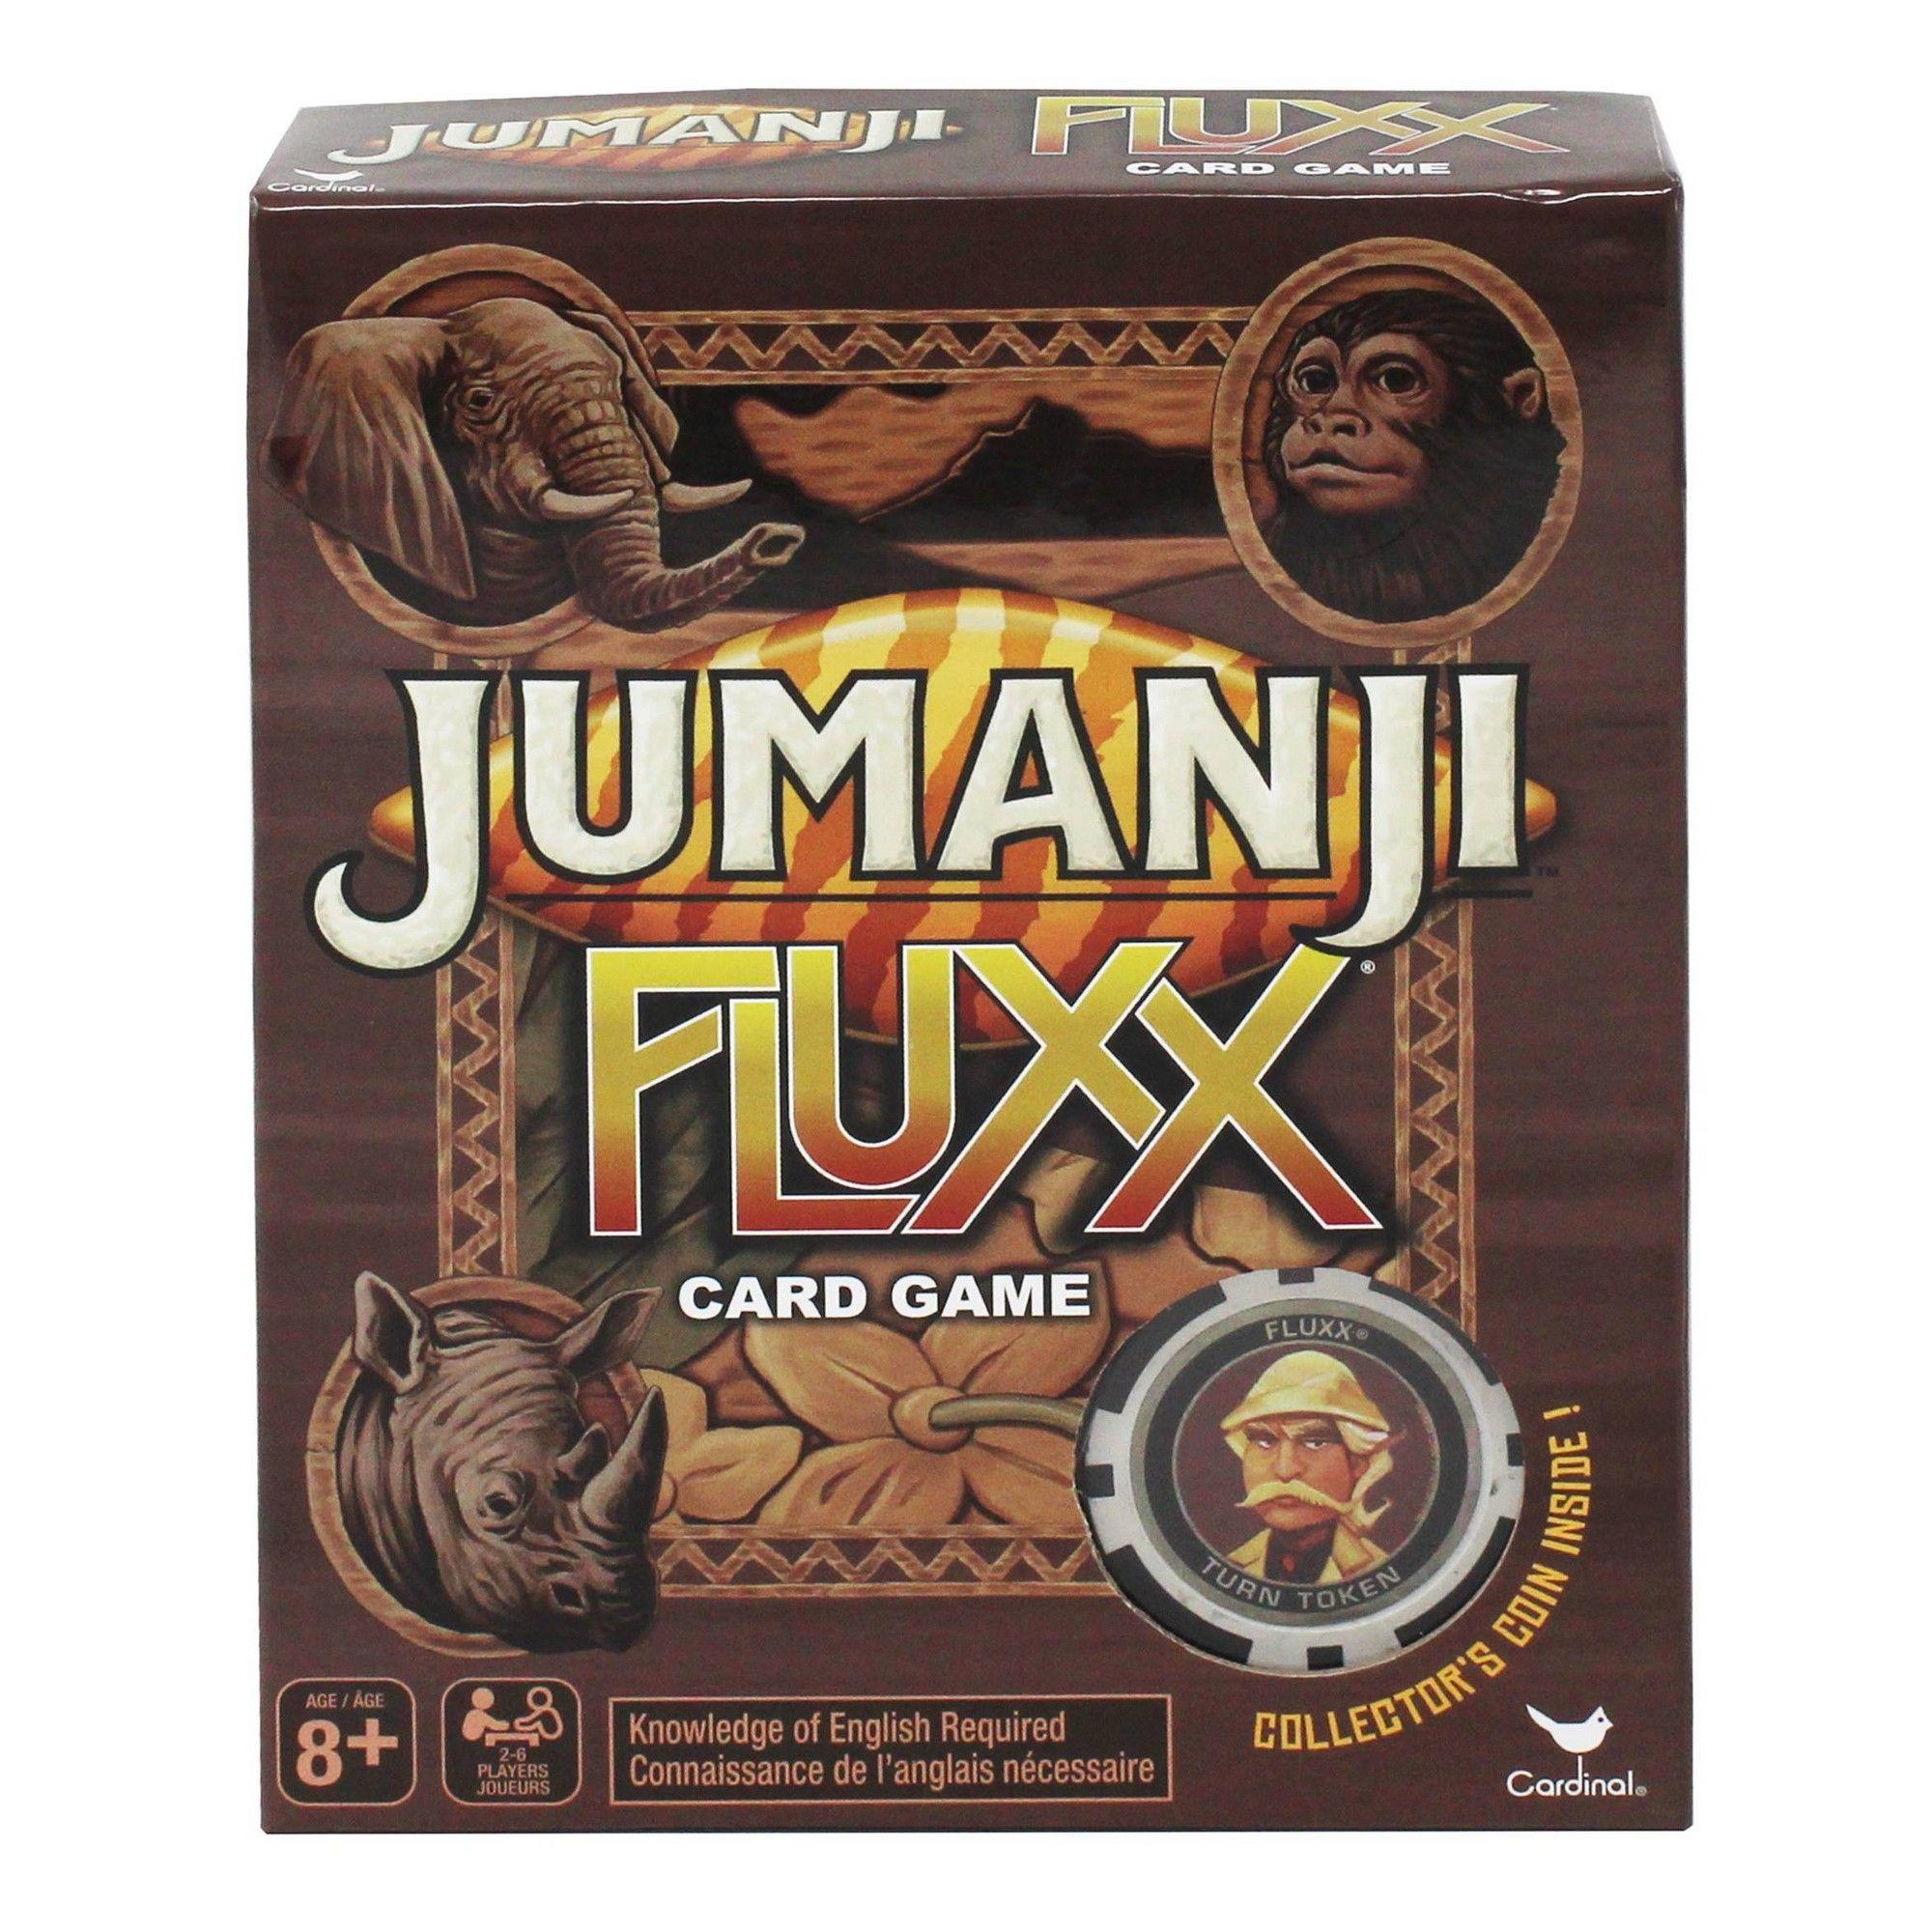 Jumanji Fluxx Card Game, card games Card games, Cards, Games